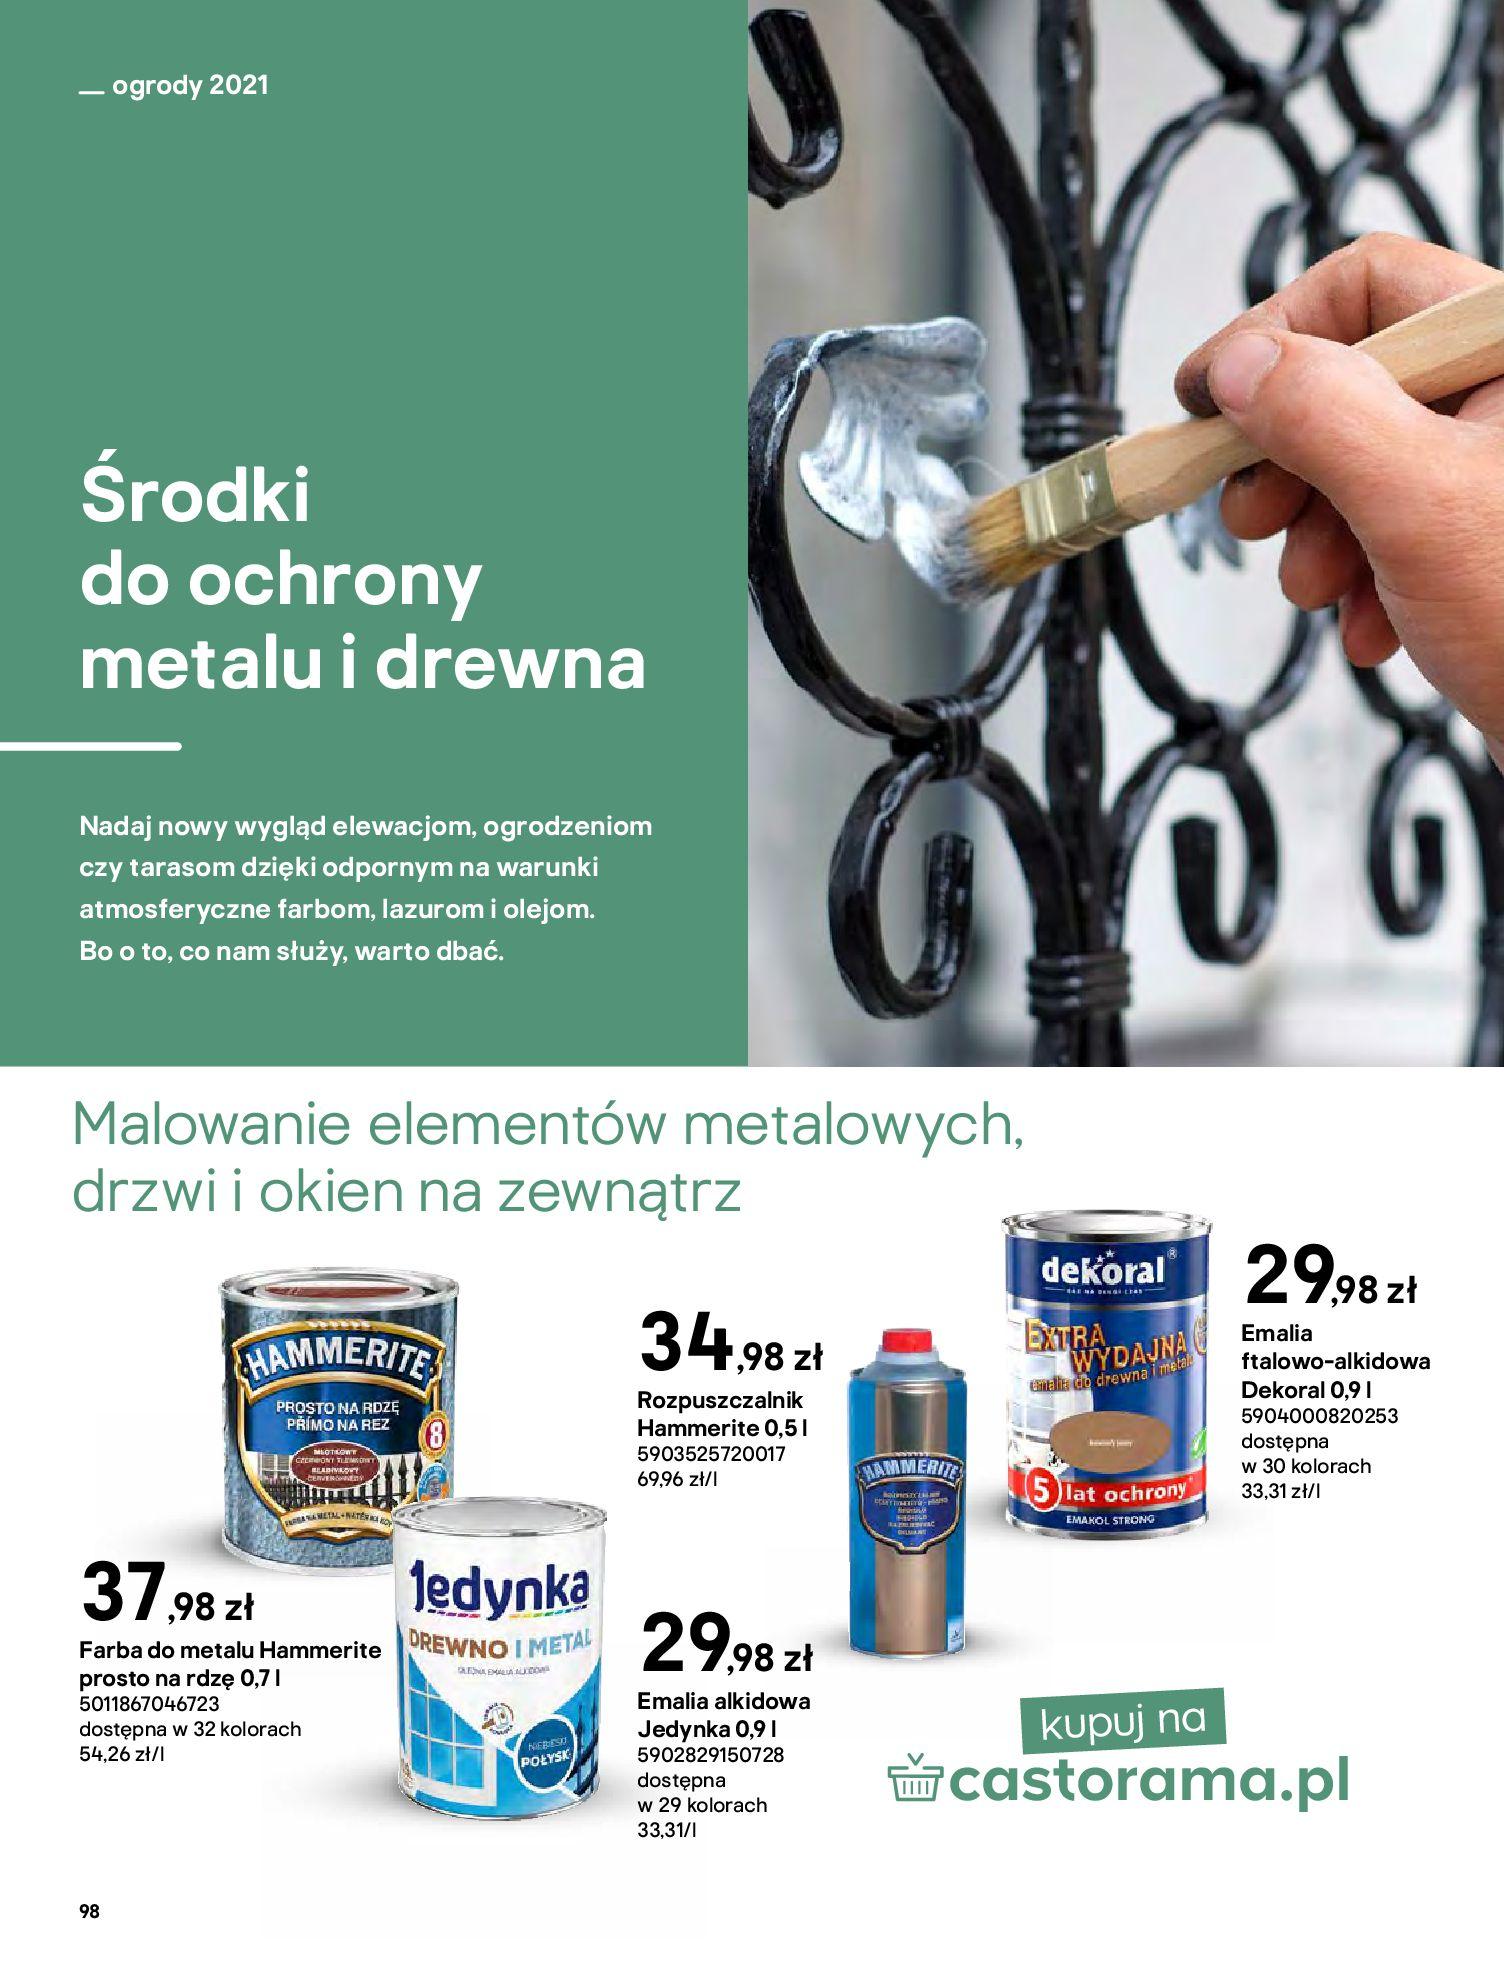 Gazetka Castorama: Katalog ogrody 2021-03-01 page-98